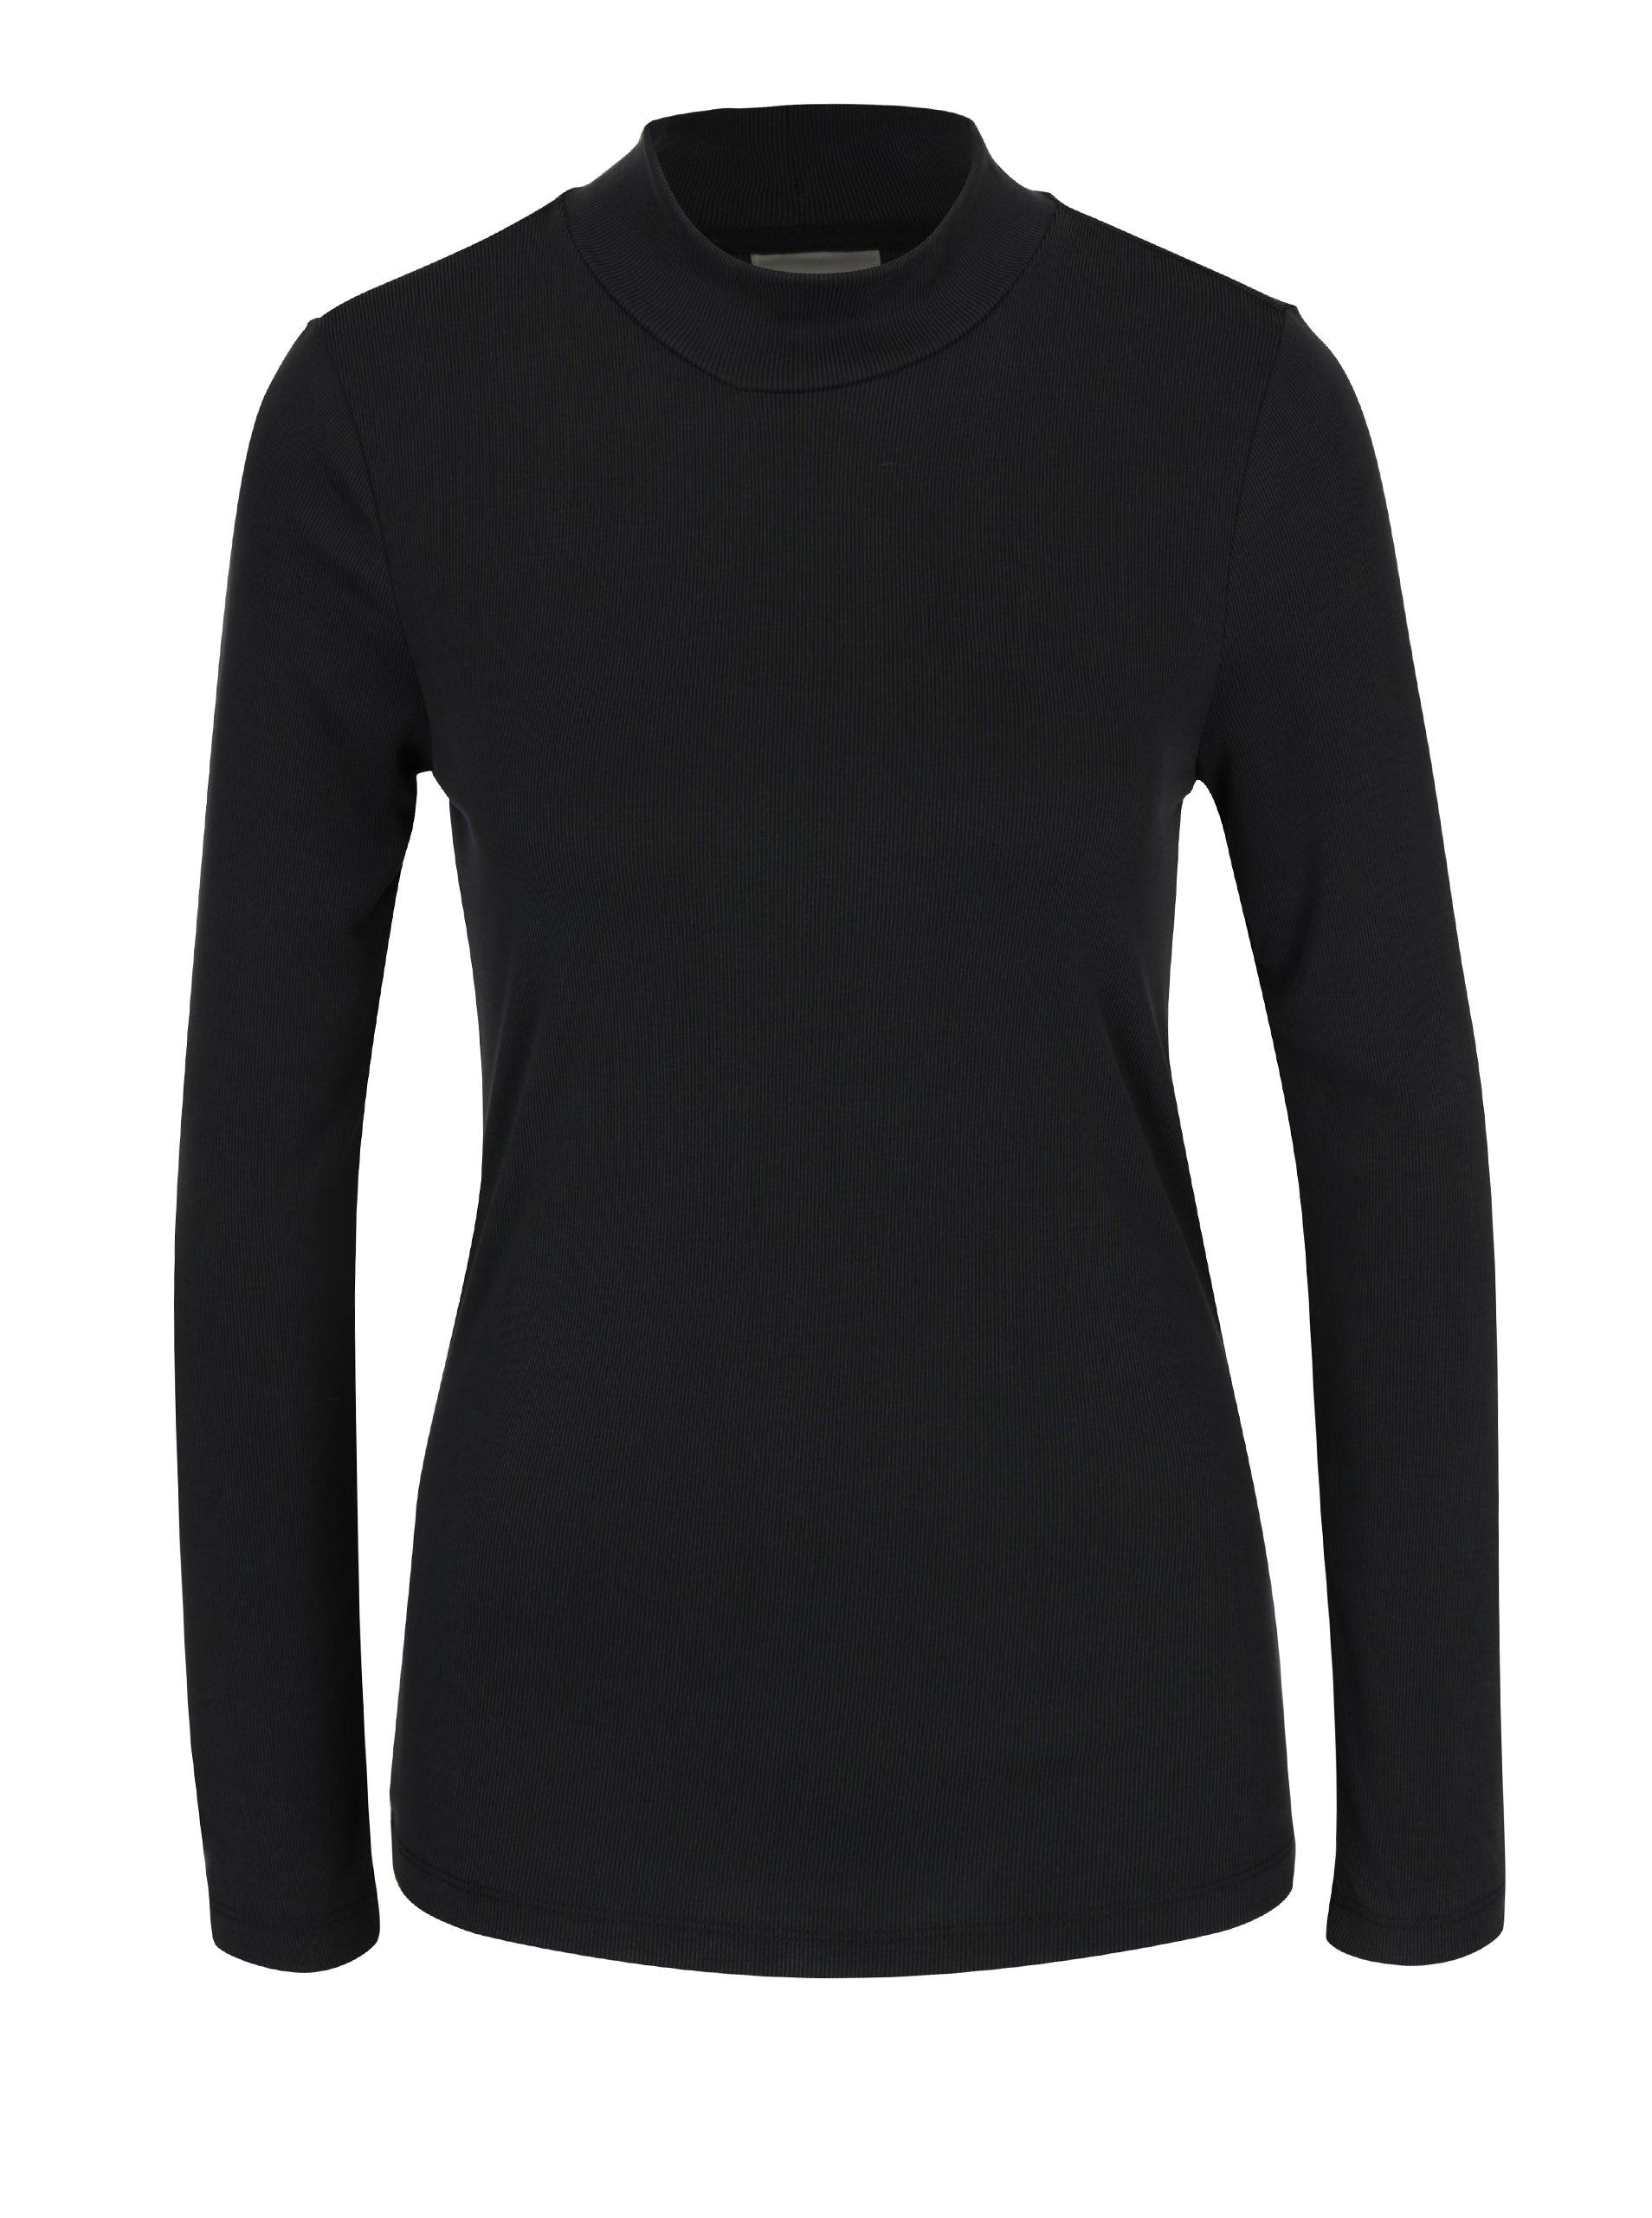 Černé žebrované tričko se stojáčkem Selected Femme Aria